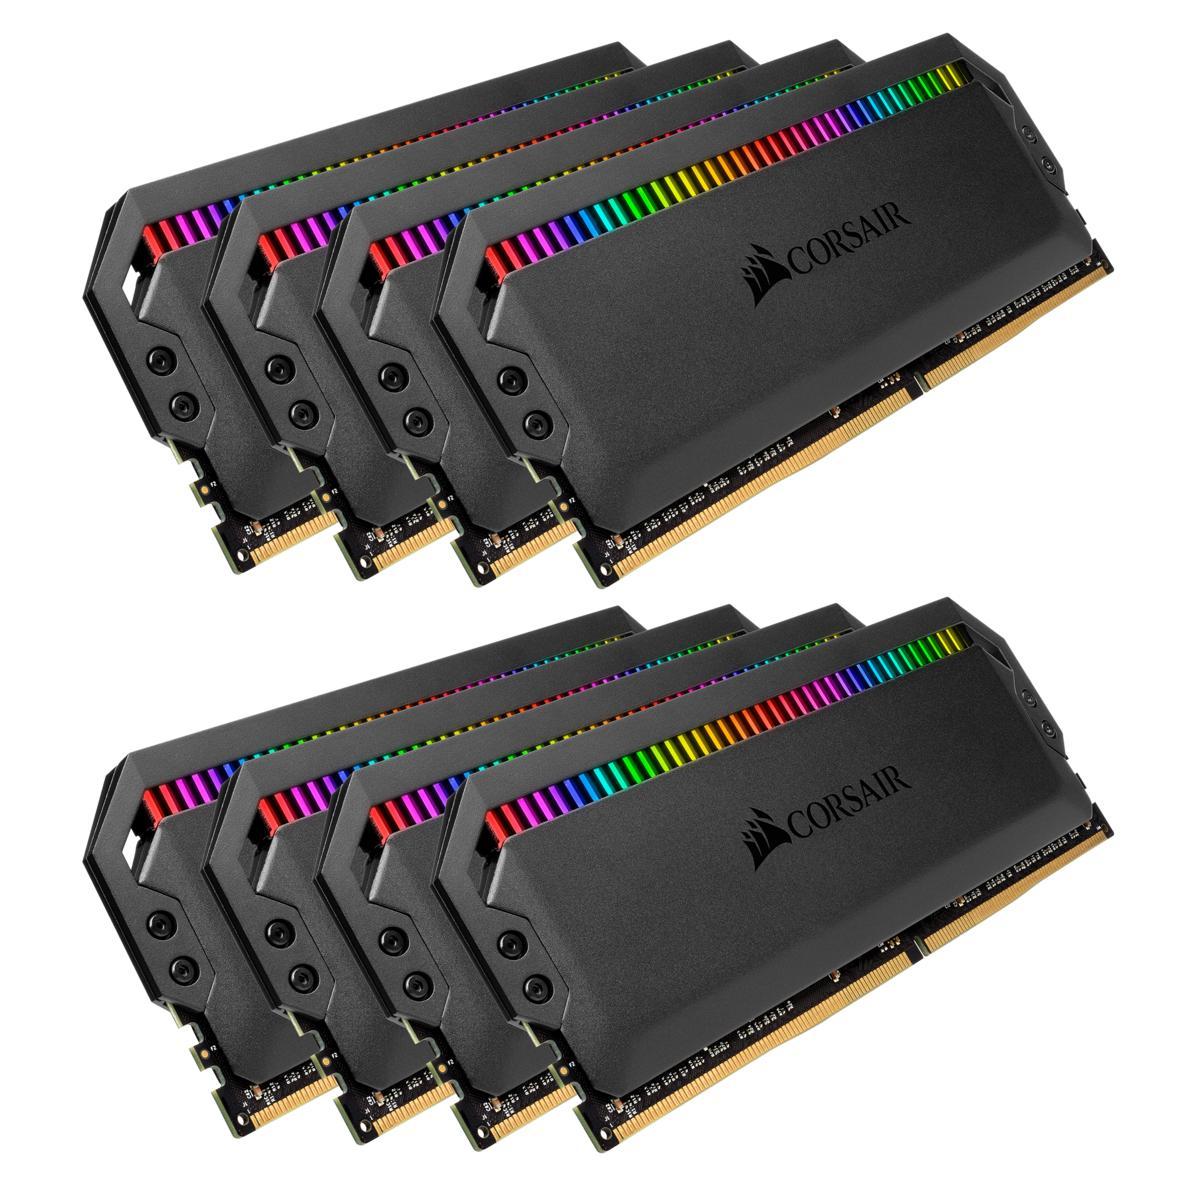 Corsair DOMINATOR PLATINUM RGB 128 GB (8 x 16 GB) DDR4-3800 CL19 Memory